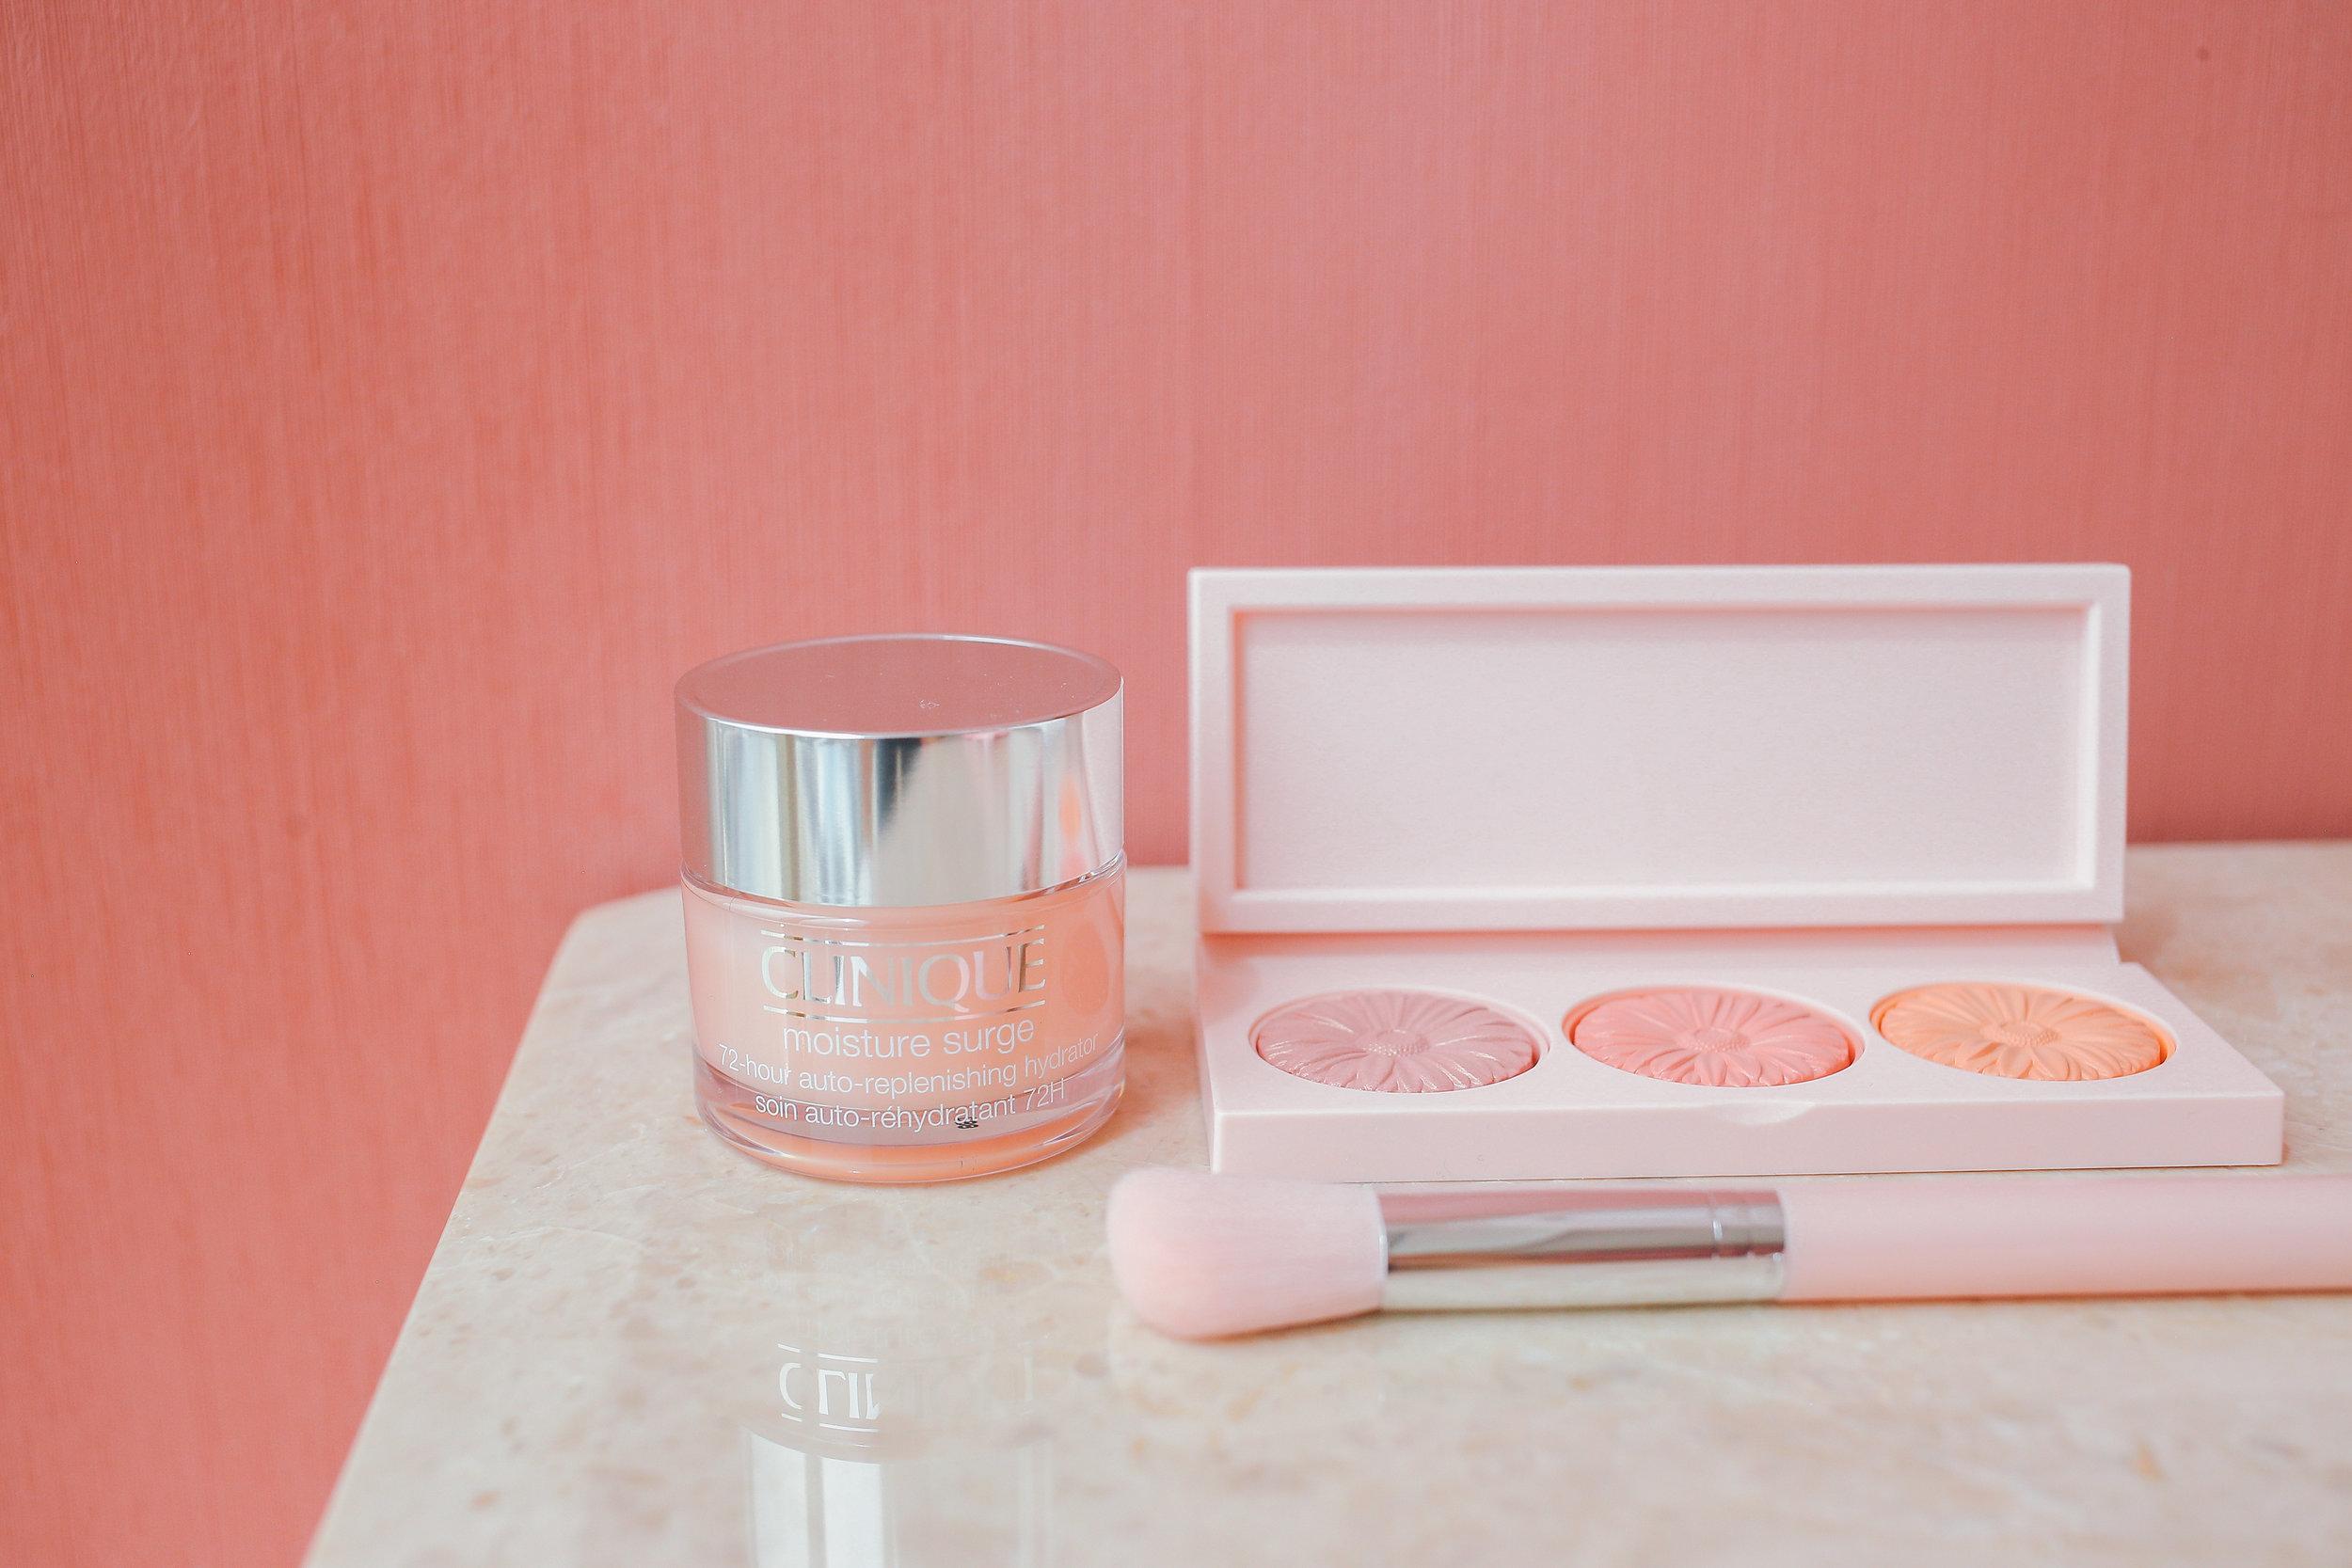 clinique-pink-oasis-philippines-moisture-surge-72-hr-auto-replenishing-hydrator-cheek-pop-2.jpg